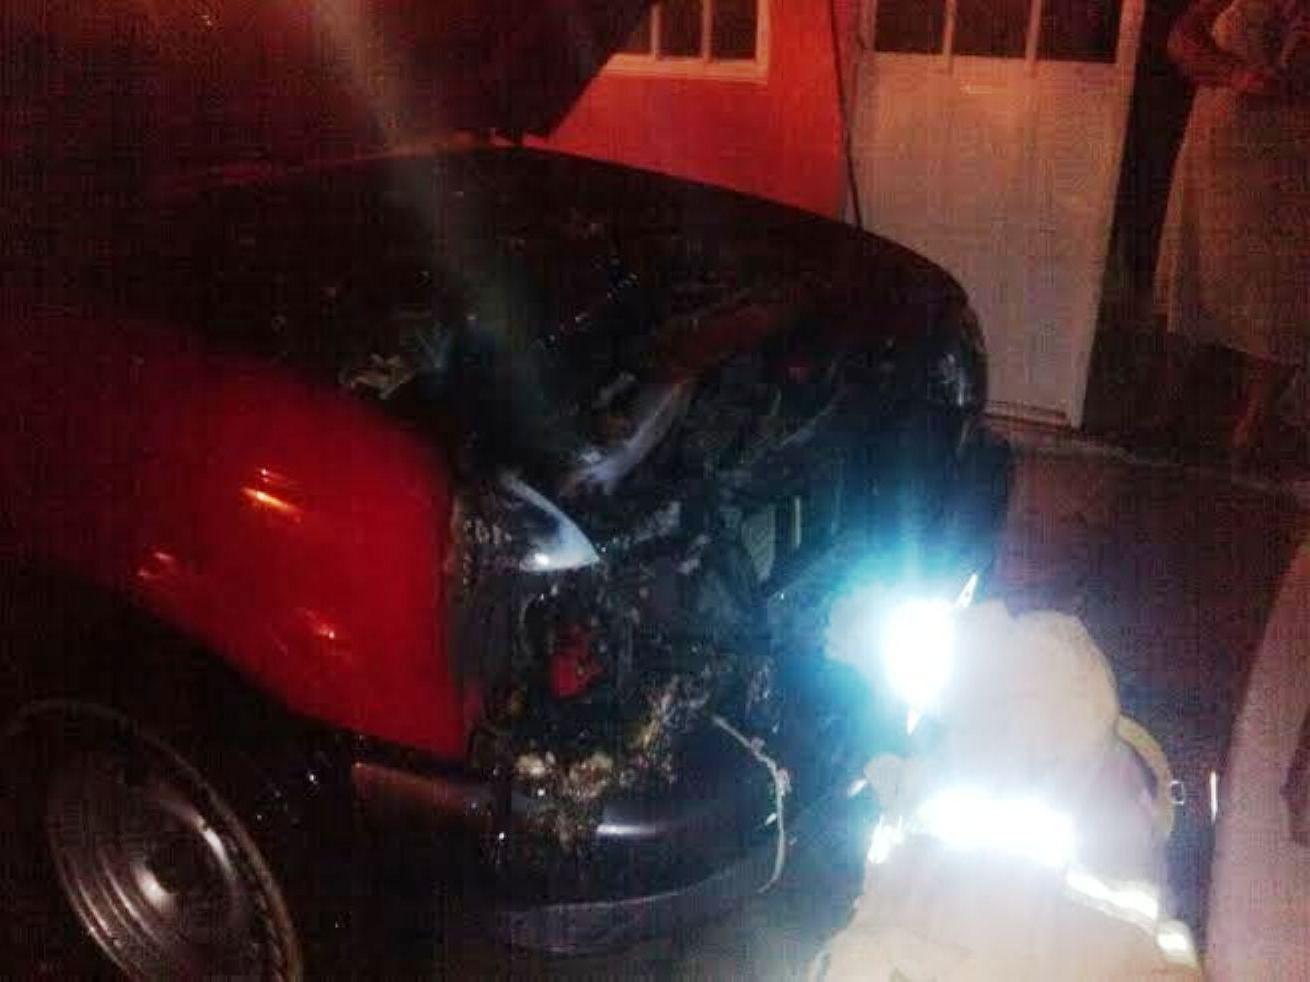 Incendian camioneta en calles de Huajuapan - e-oaxaca Periódico Digital de Oaxaca